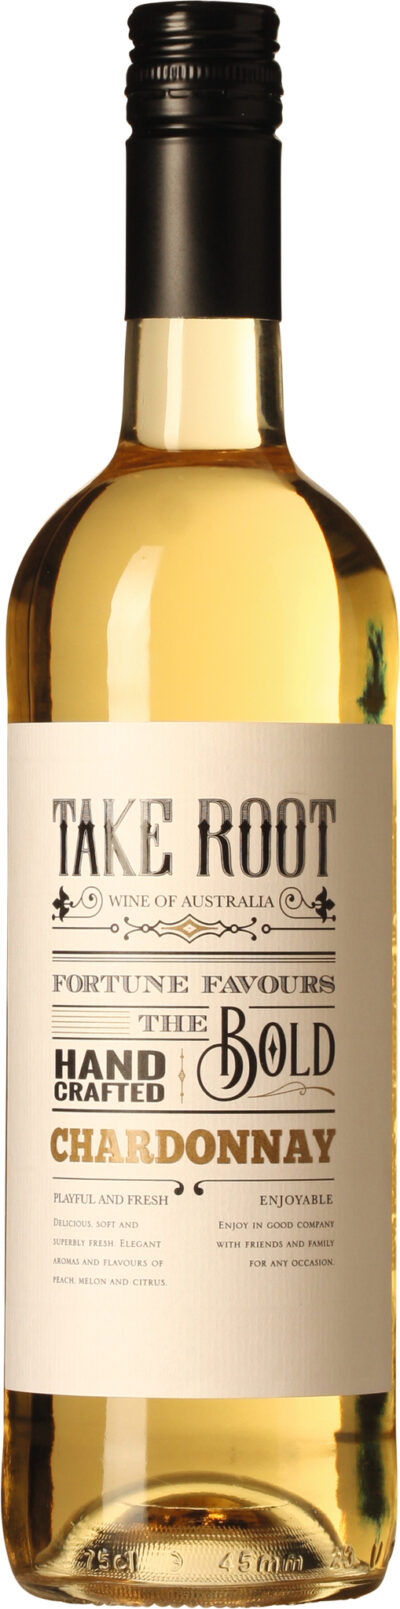 Take Root Chardonnay